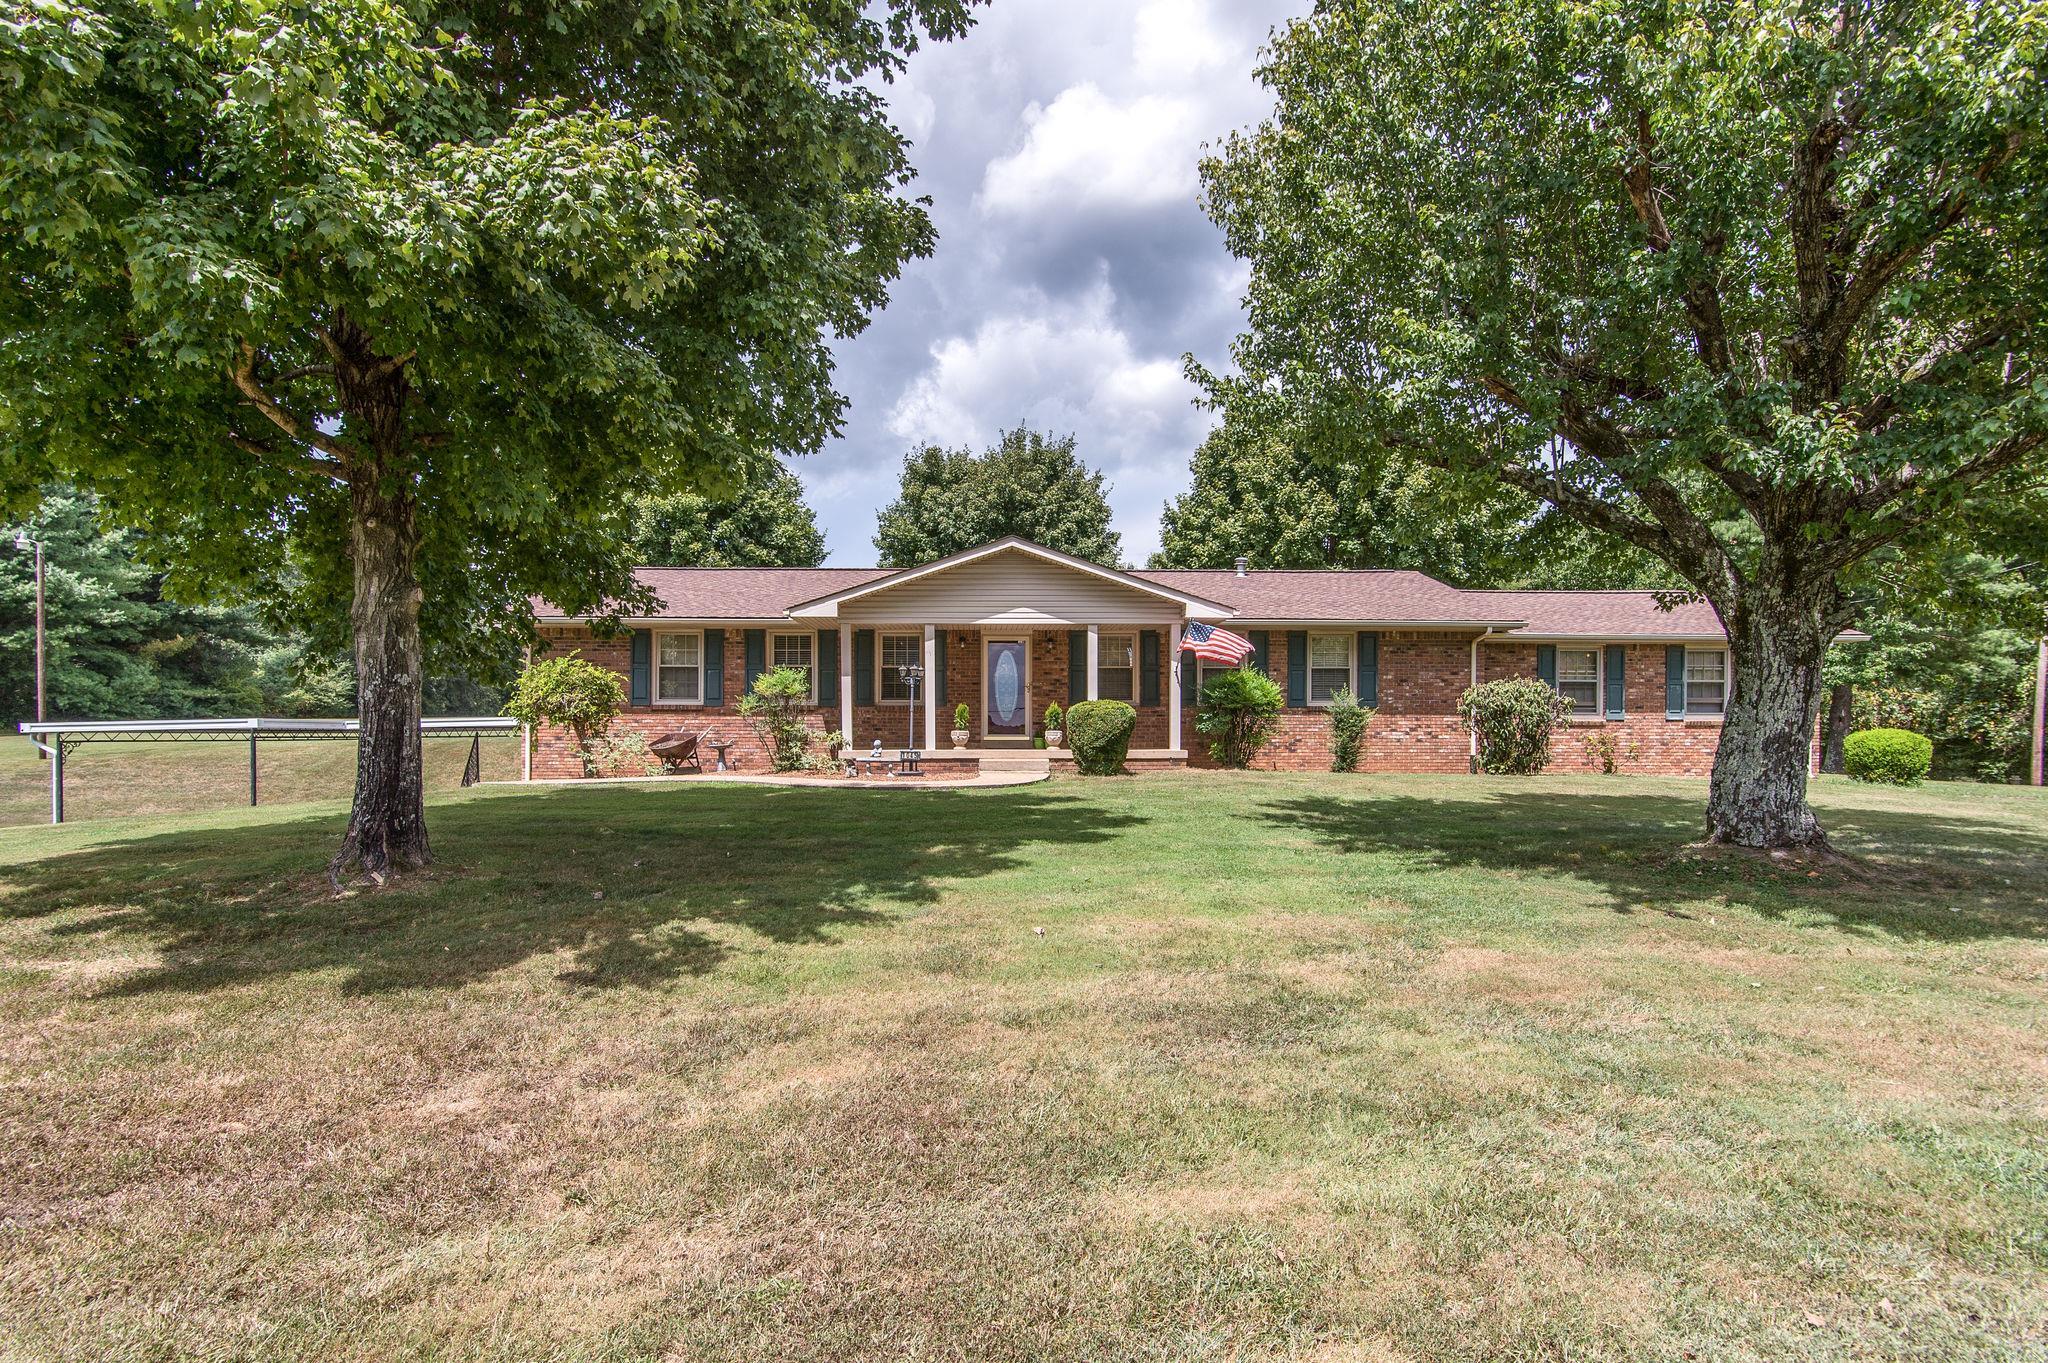 1045 Harmon Springs Rd, Dickson, TN 37055 - Dickson, TN real estate listing